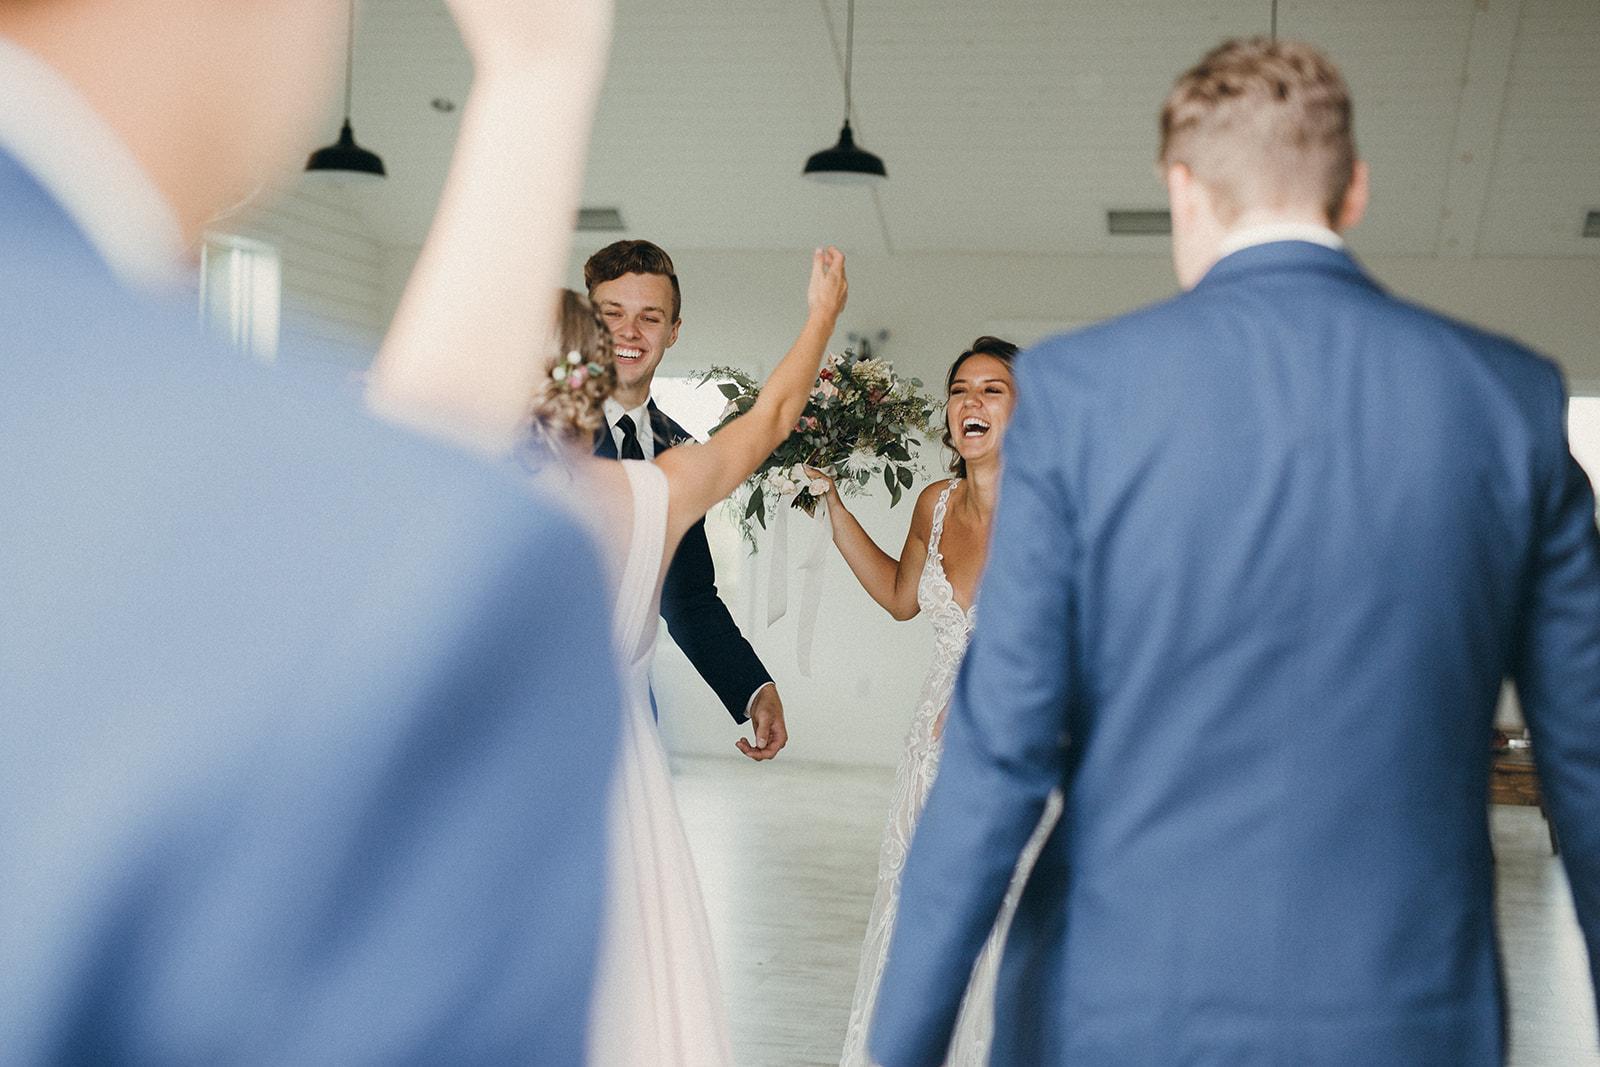 kaden_justine_wedding_1428.jpg